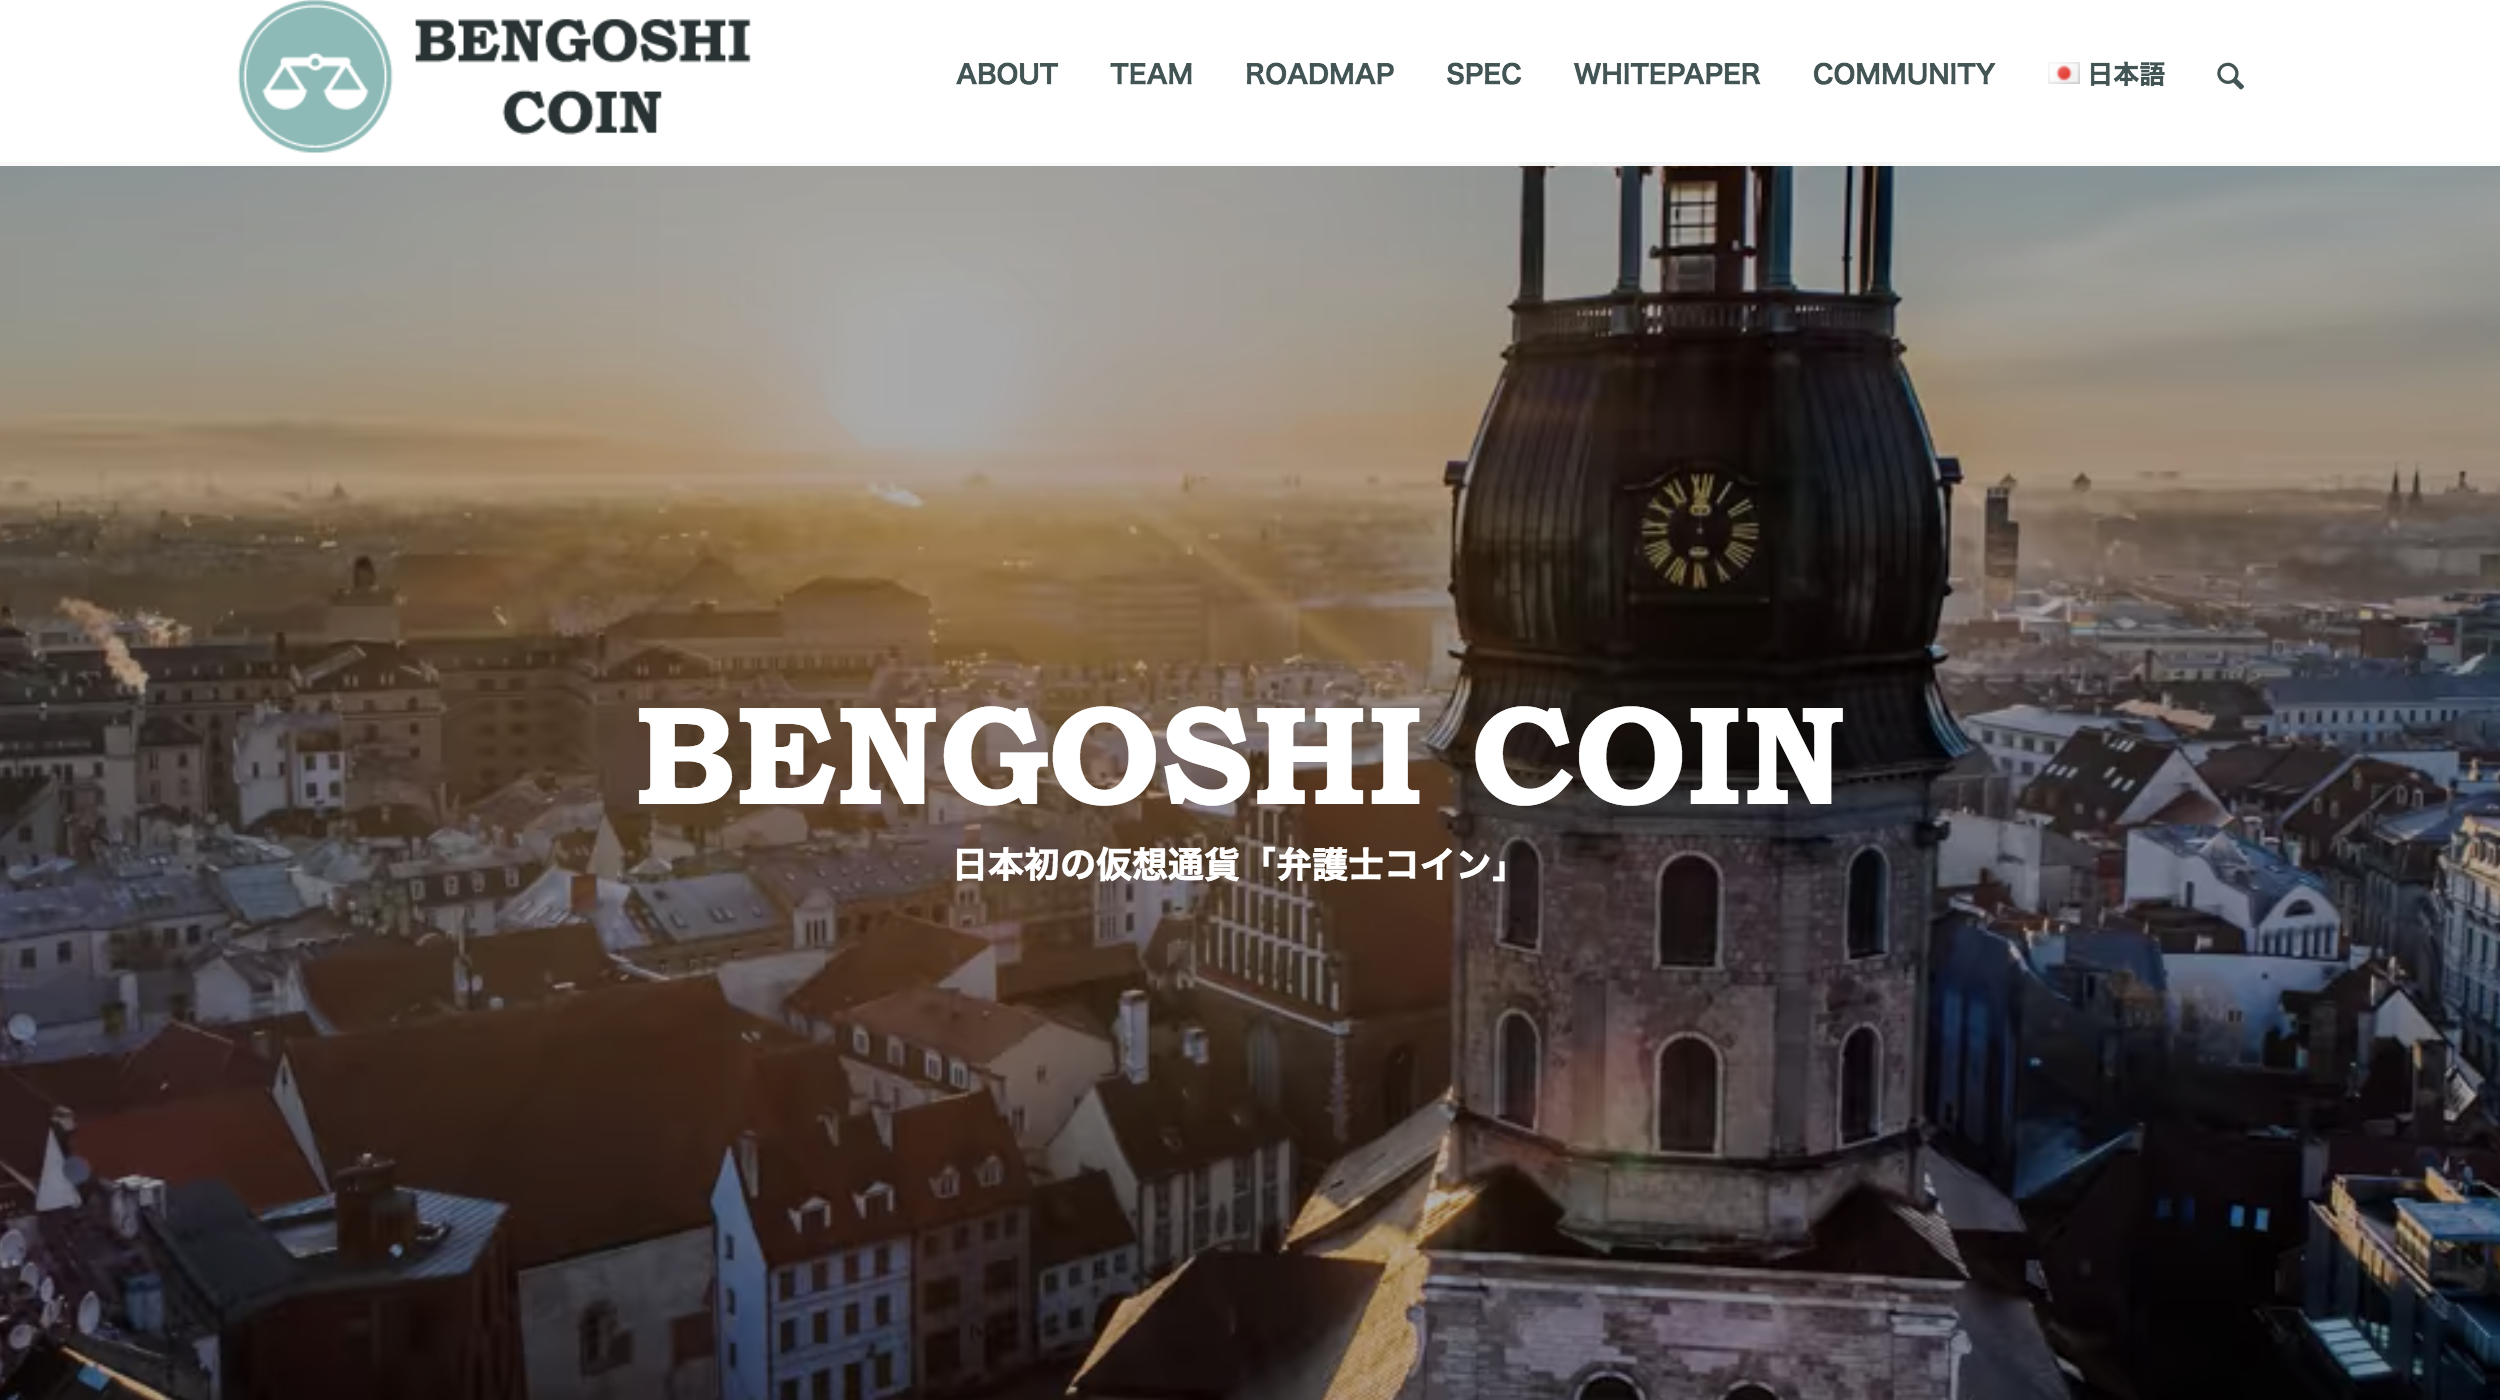 BENGOSHI COIN(ベンゴシコイン) Airdrop(エアドロップ)